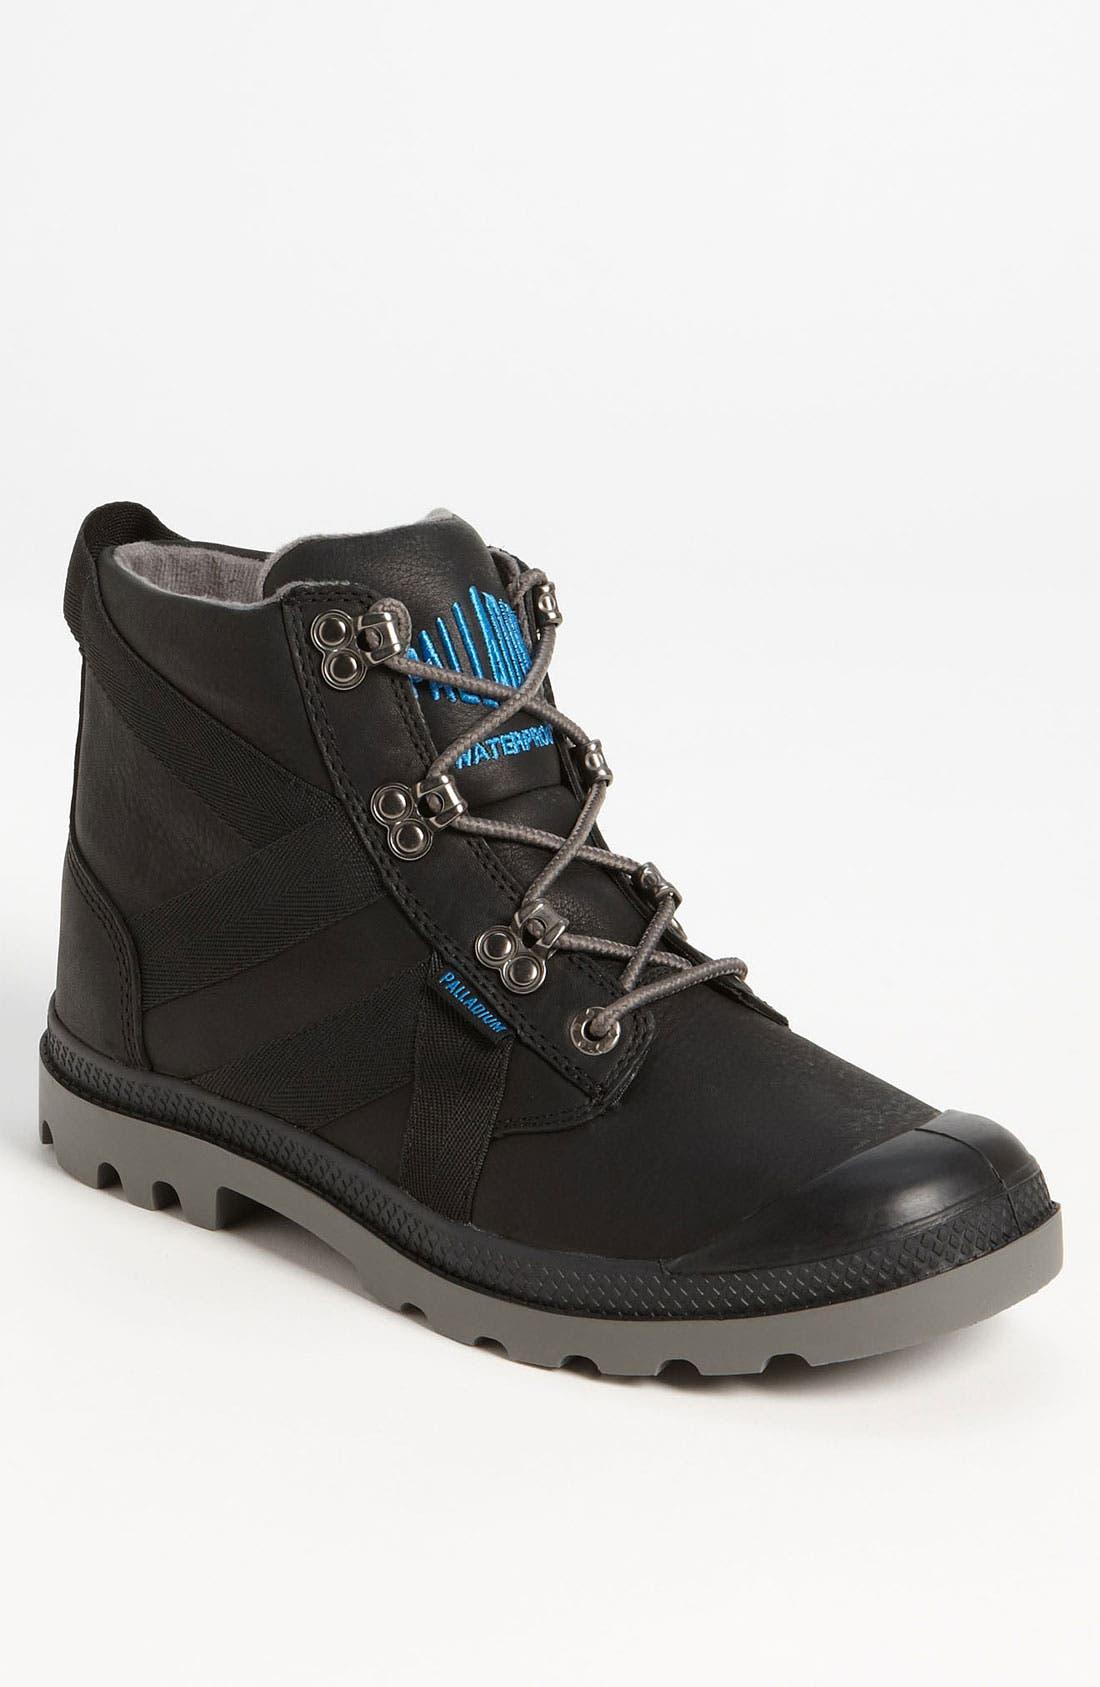 Main Image - Palladium 'Pampa' Boot